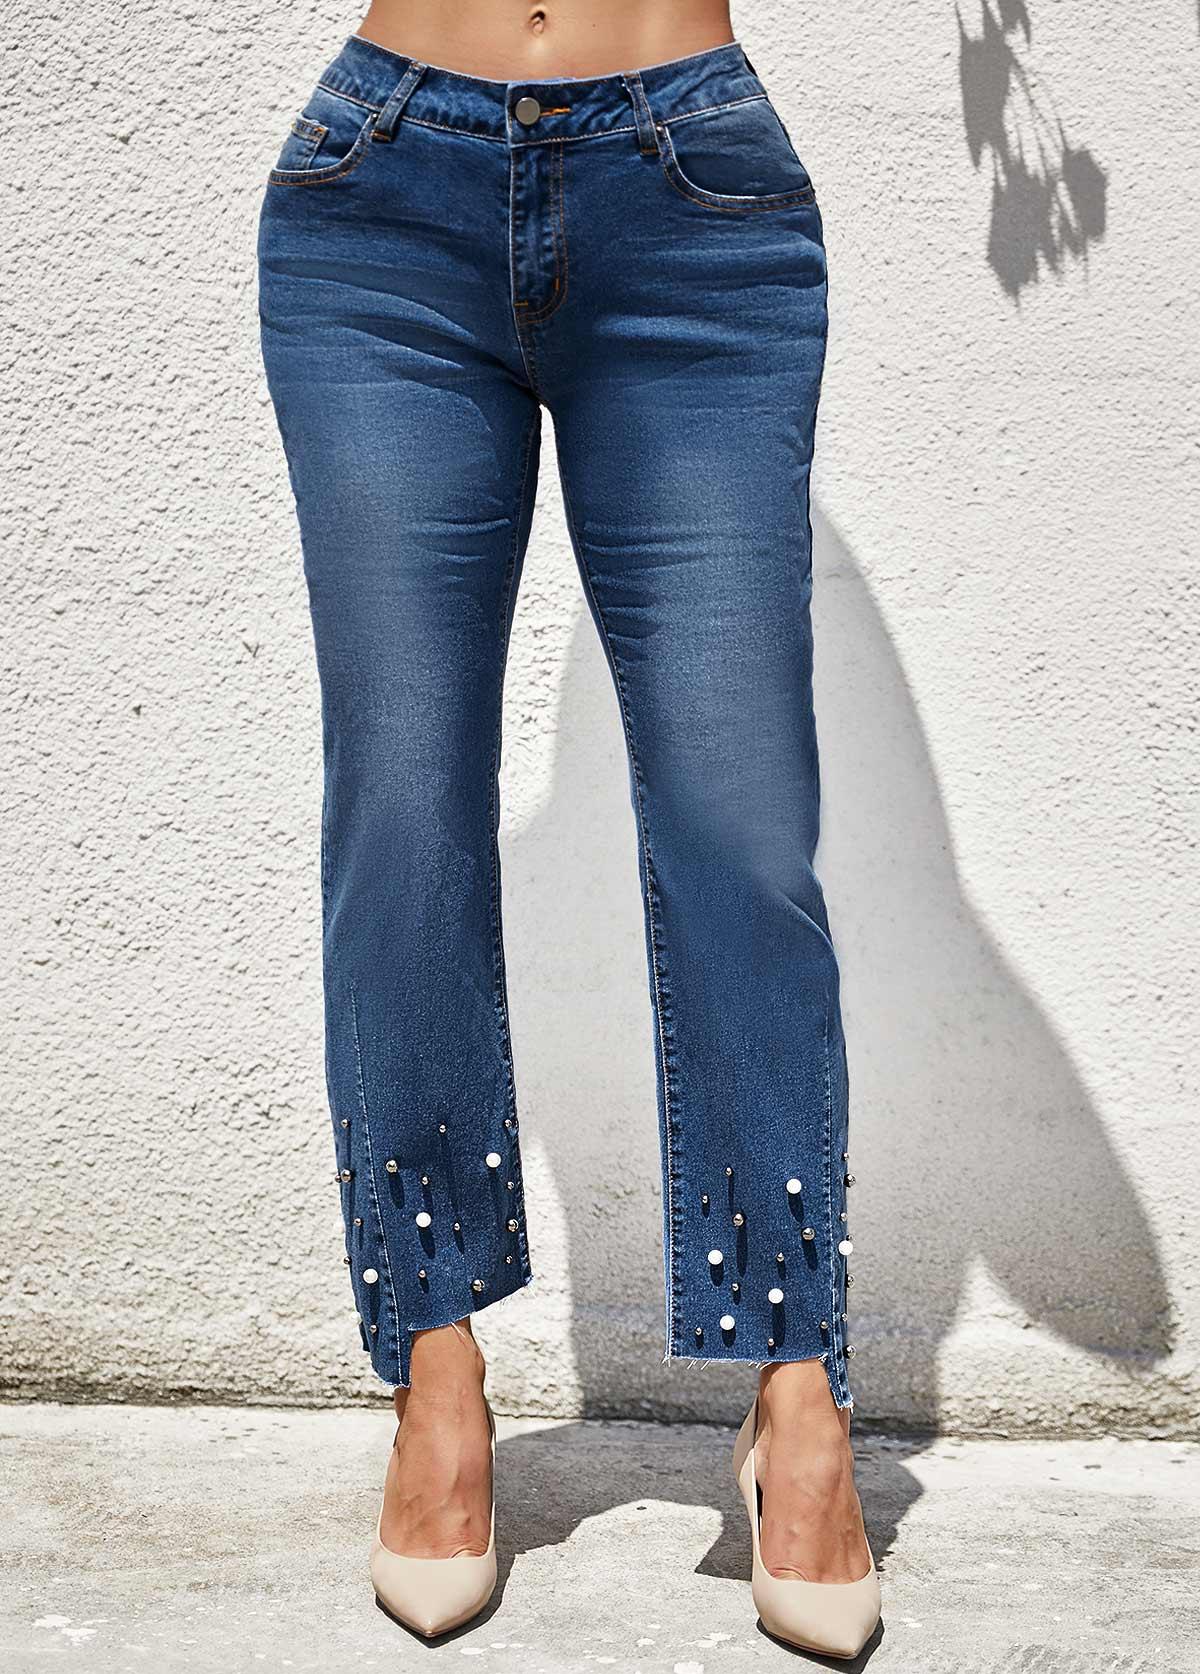 ROTITA Mid Waist Beads Detail Pocket Jeans